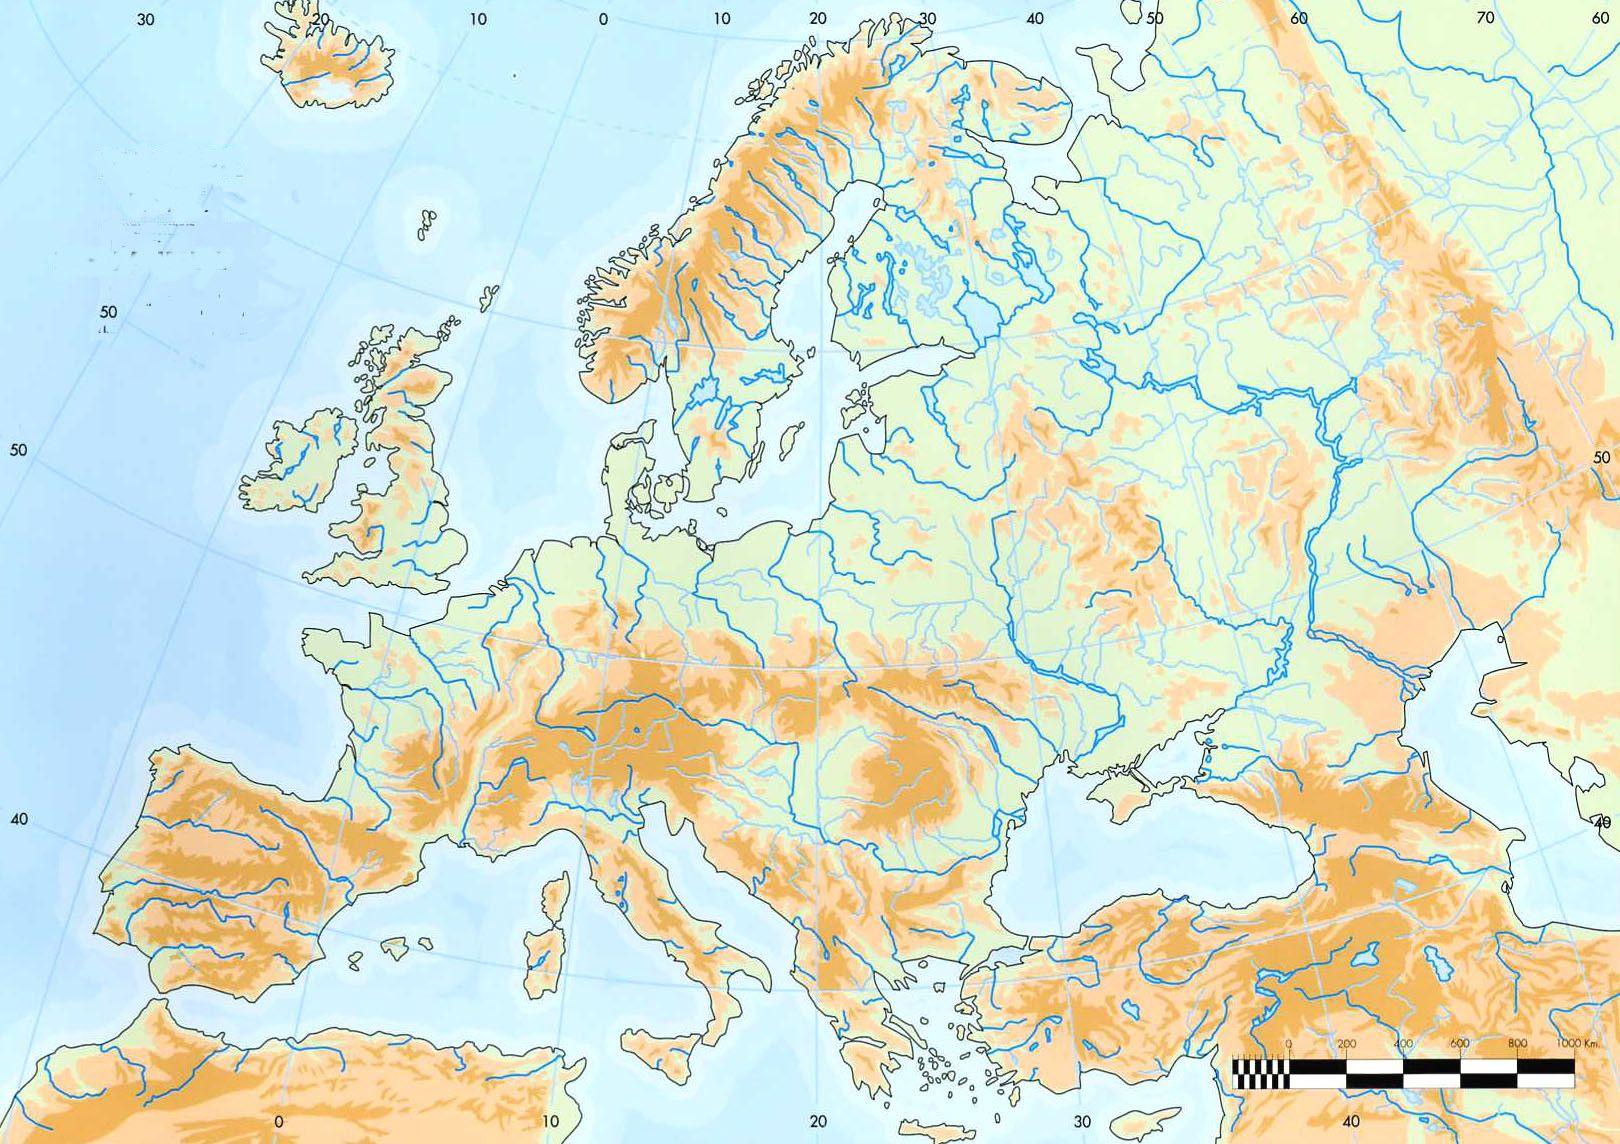 Mapa Europa Fisico Rios.Mapa Fisico De Europa By Jorgeqnc On Genial Ly